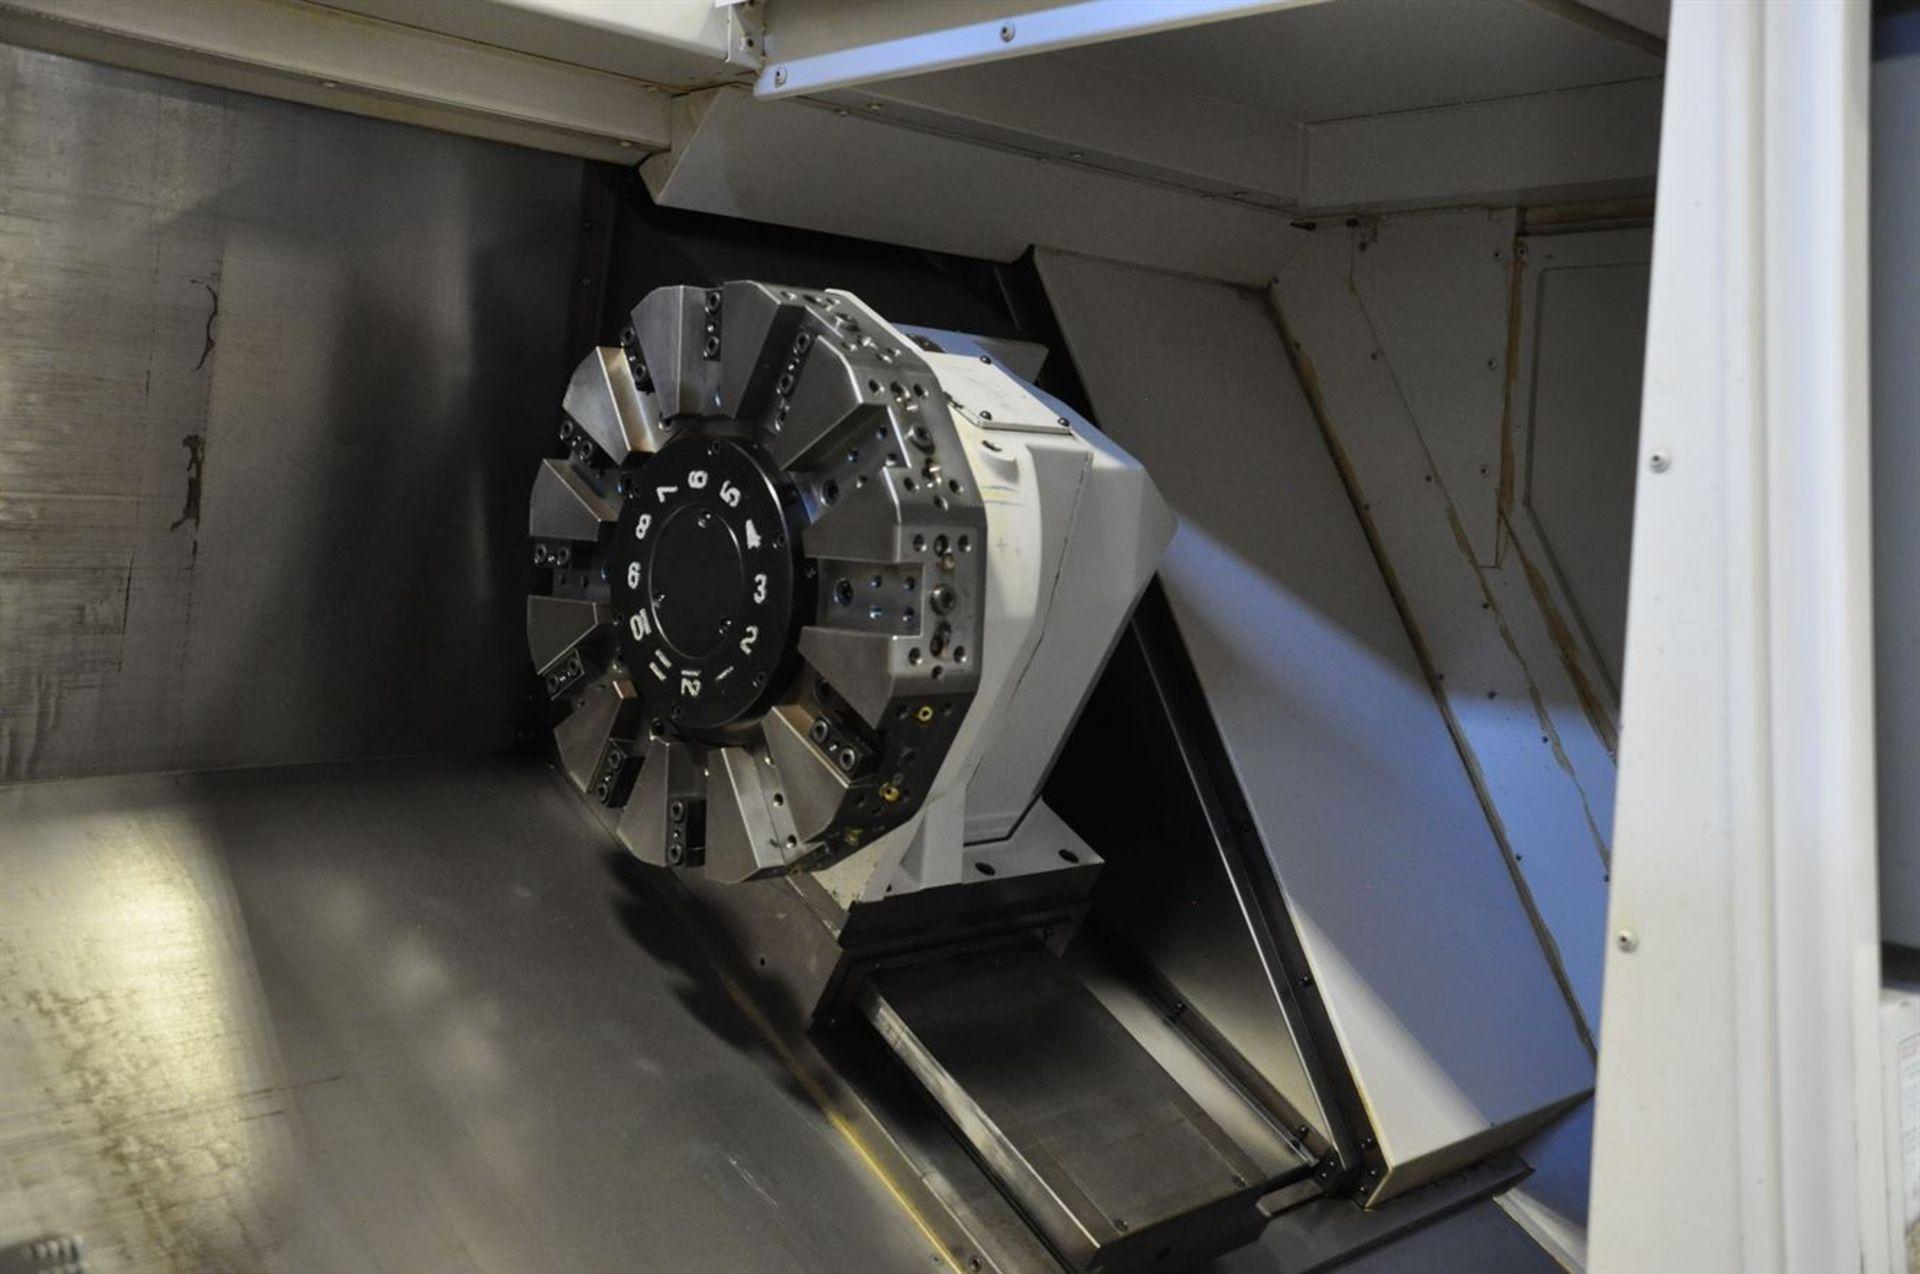 "2012 OKUMA SPACE TURN LB4000 EX CNC Chucker, s/n 161411, w/ OSP-P200LA Control, 3.5"" Bore, SCHUNK - Image 3 of 8"